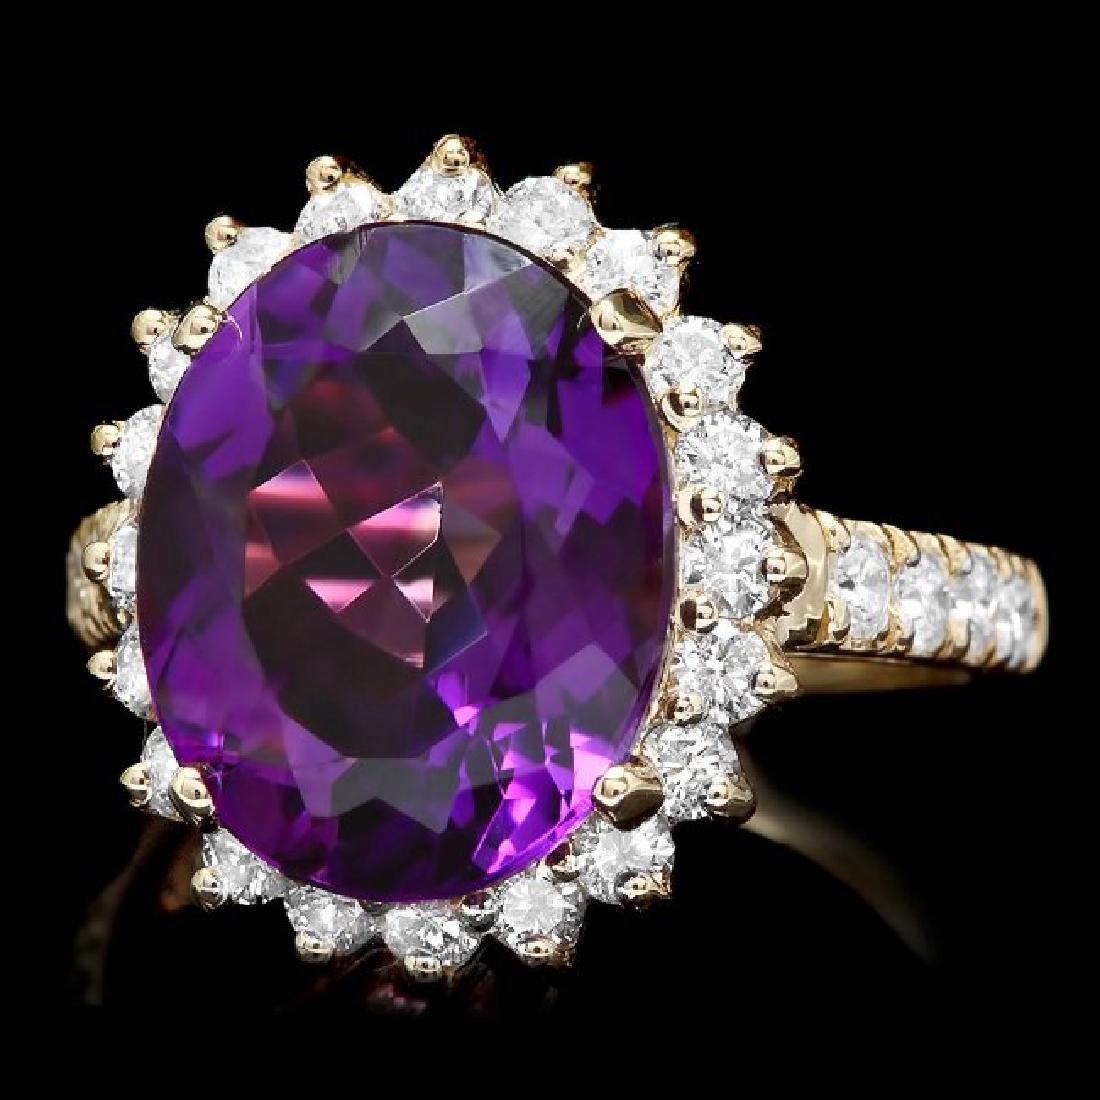 14k Gold 6.50ct Amethyst 1.10ct Diamond Ring